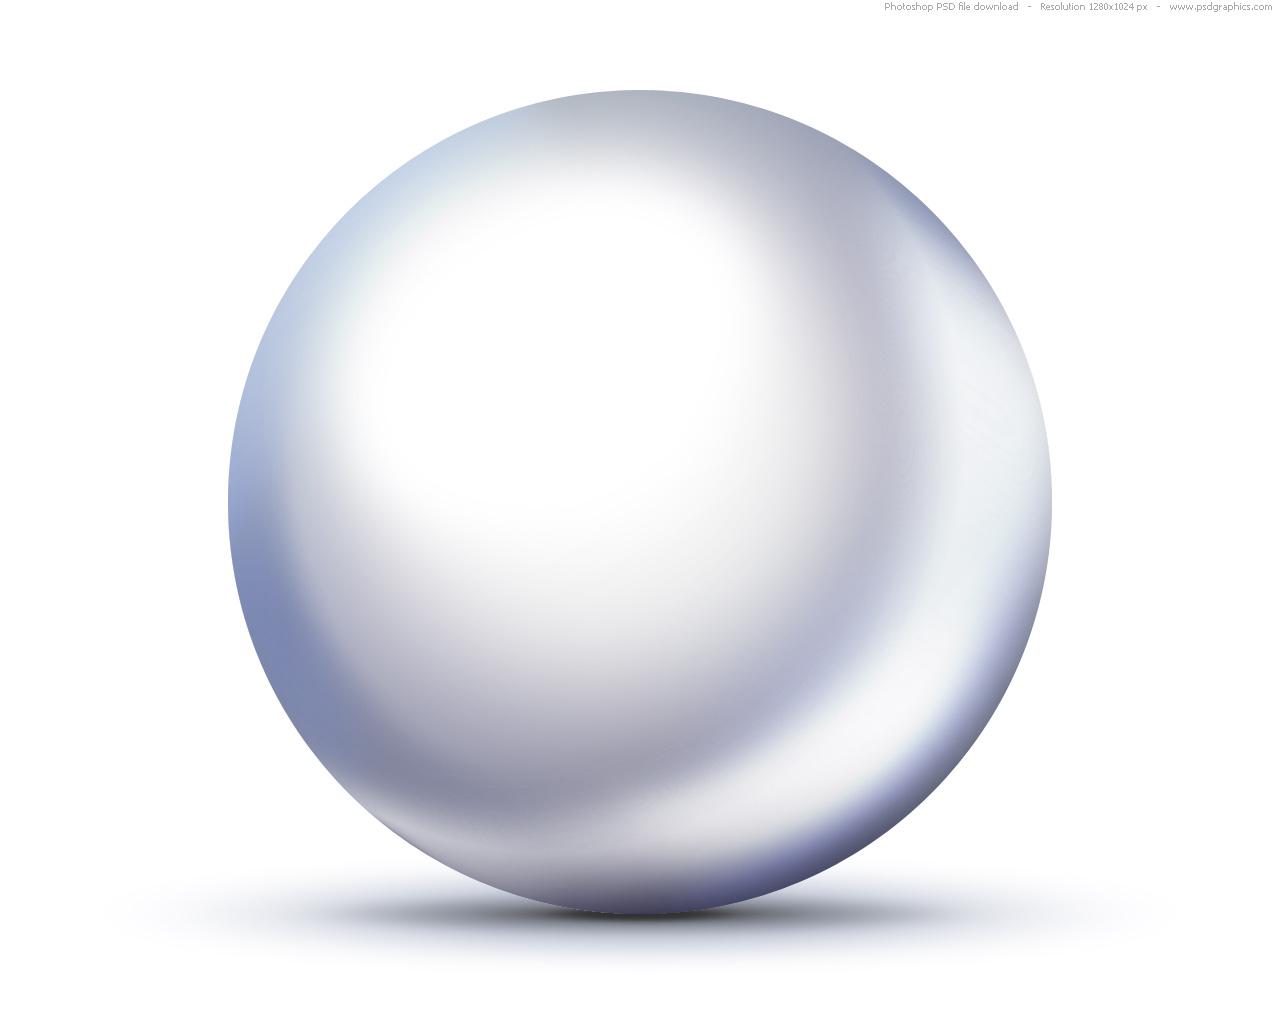 psd shiny white pearl icon psdgraphics